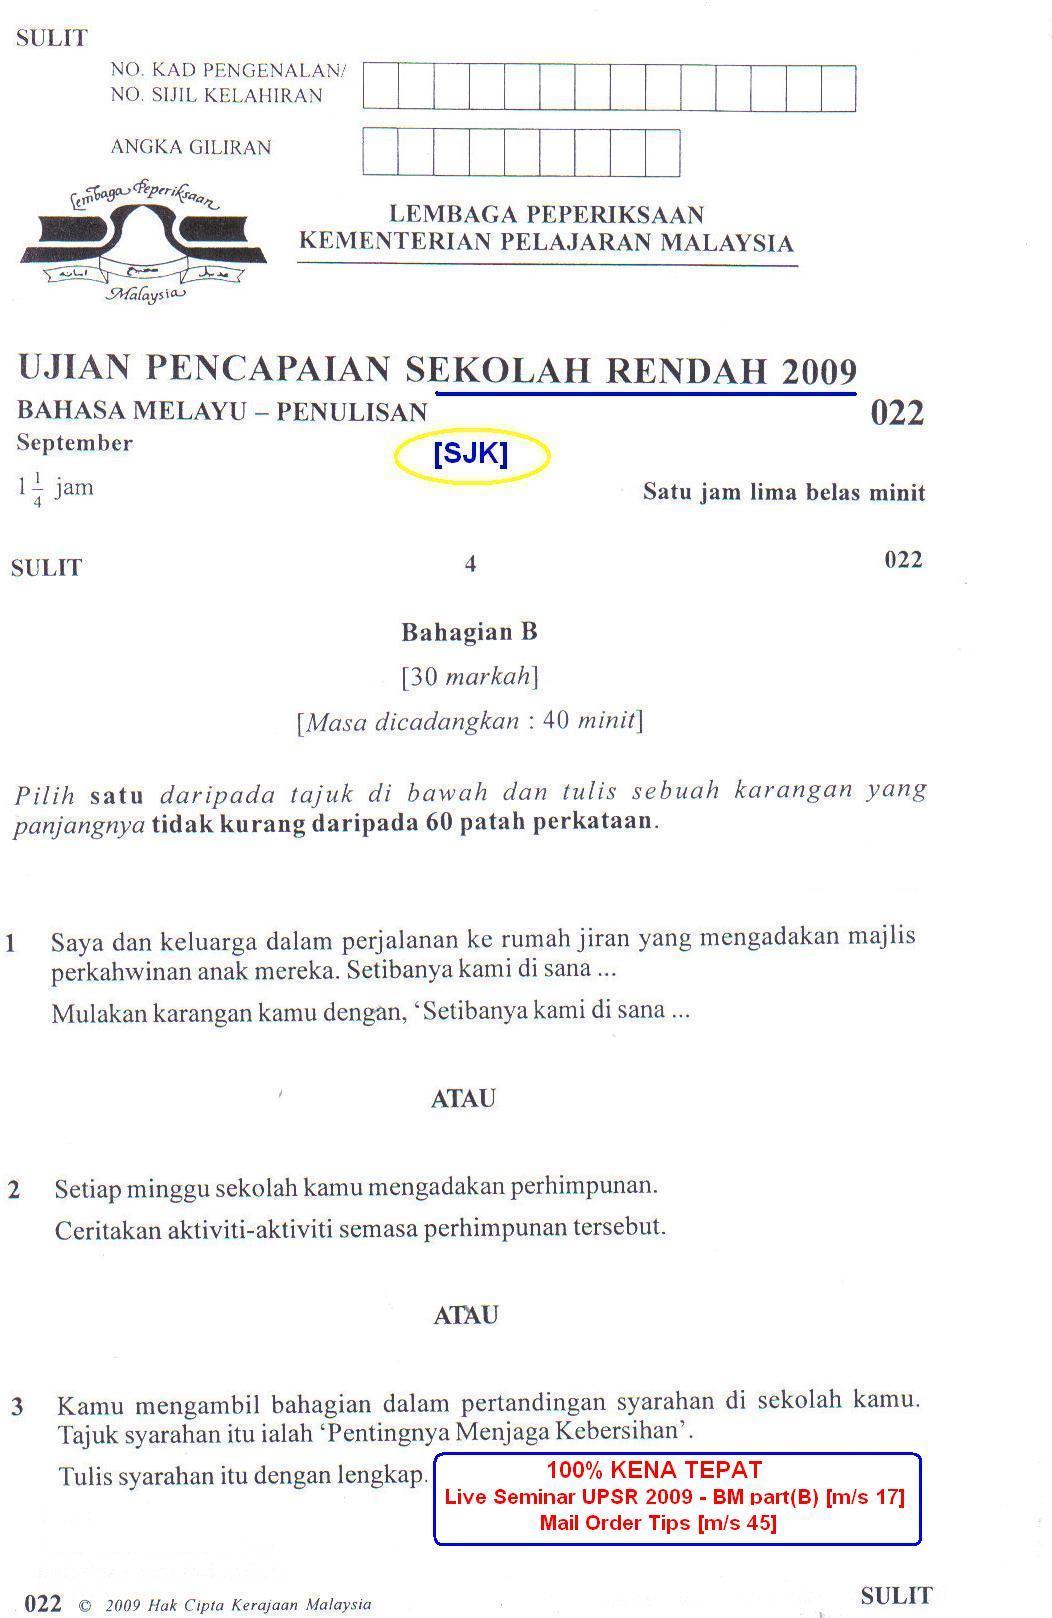 UPSR BM [SJK] KENA TEPAT 2009